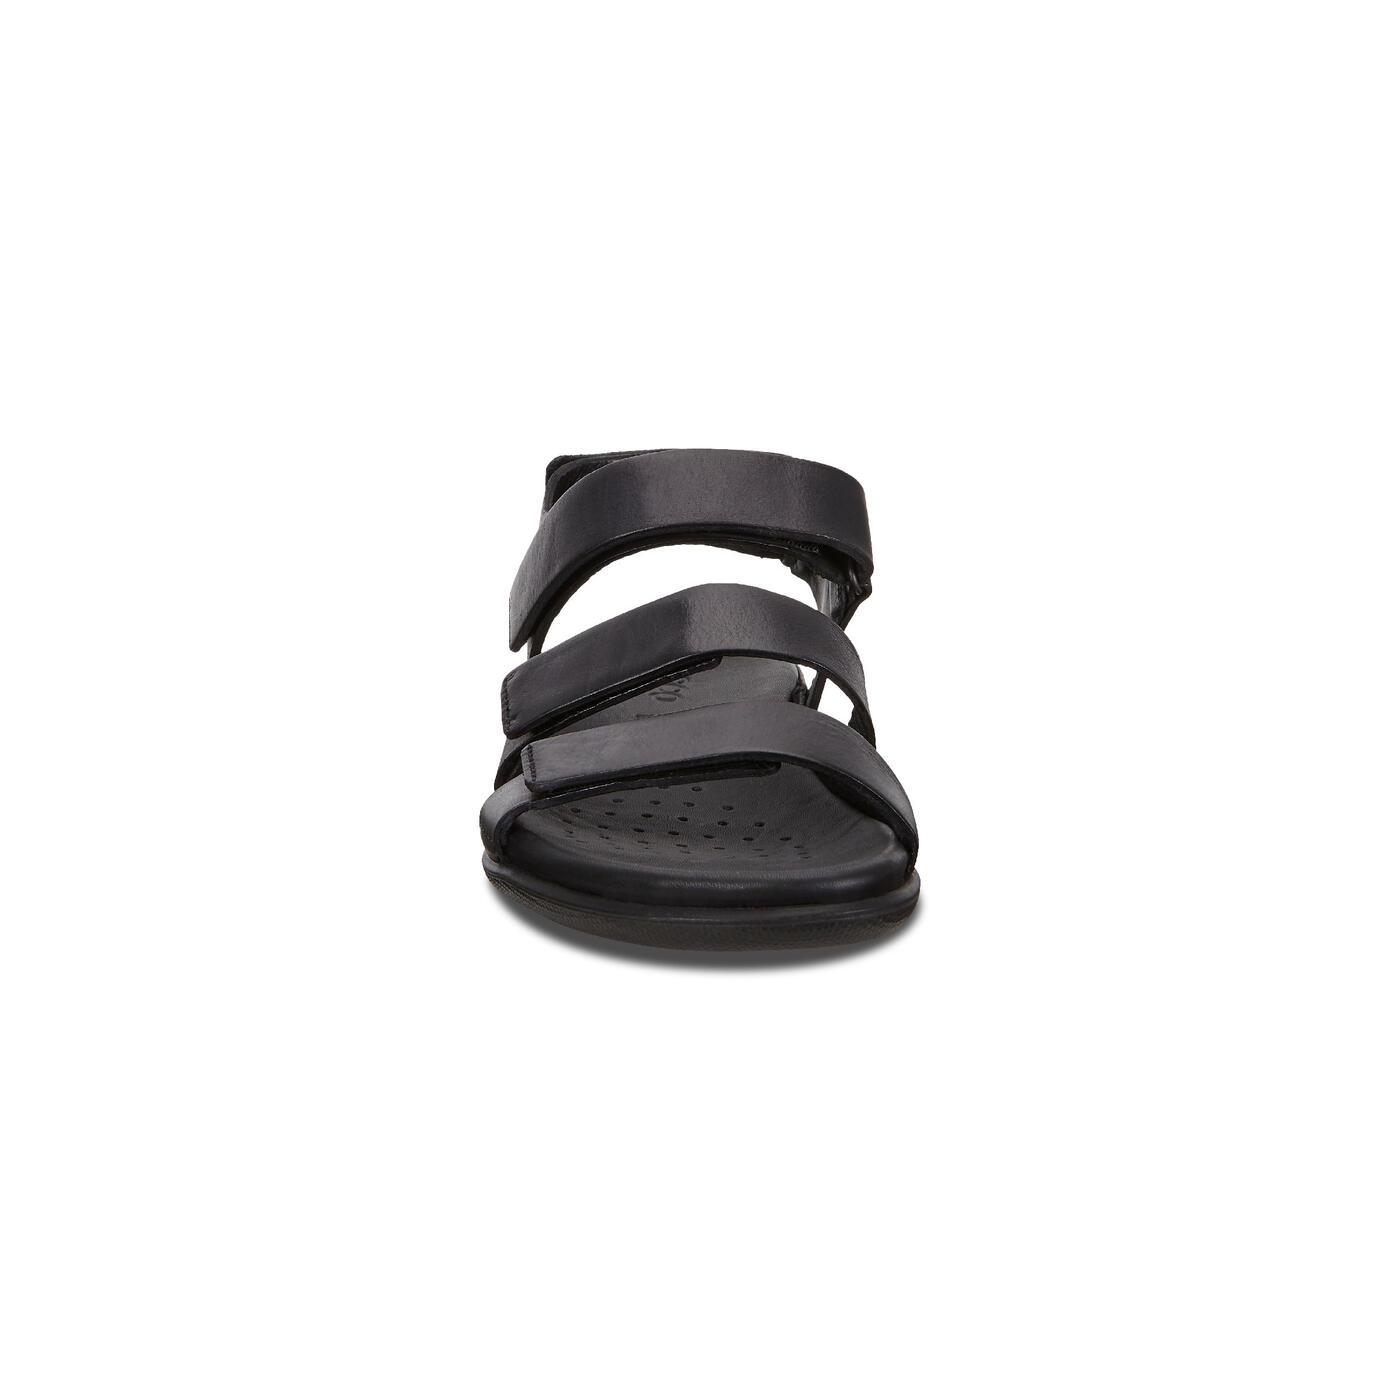 ECCO Flash Women's Flat Strap Sandals